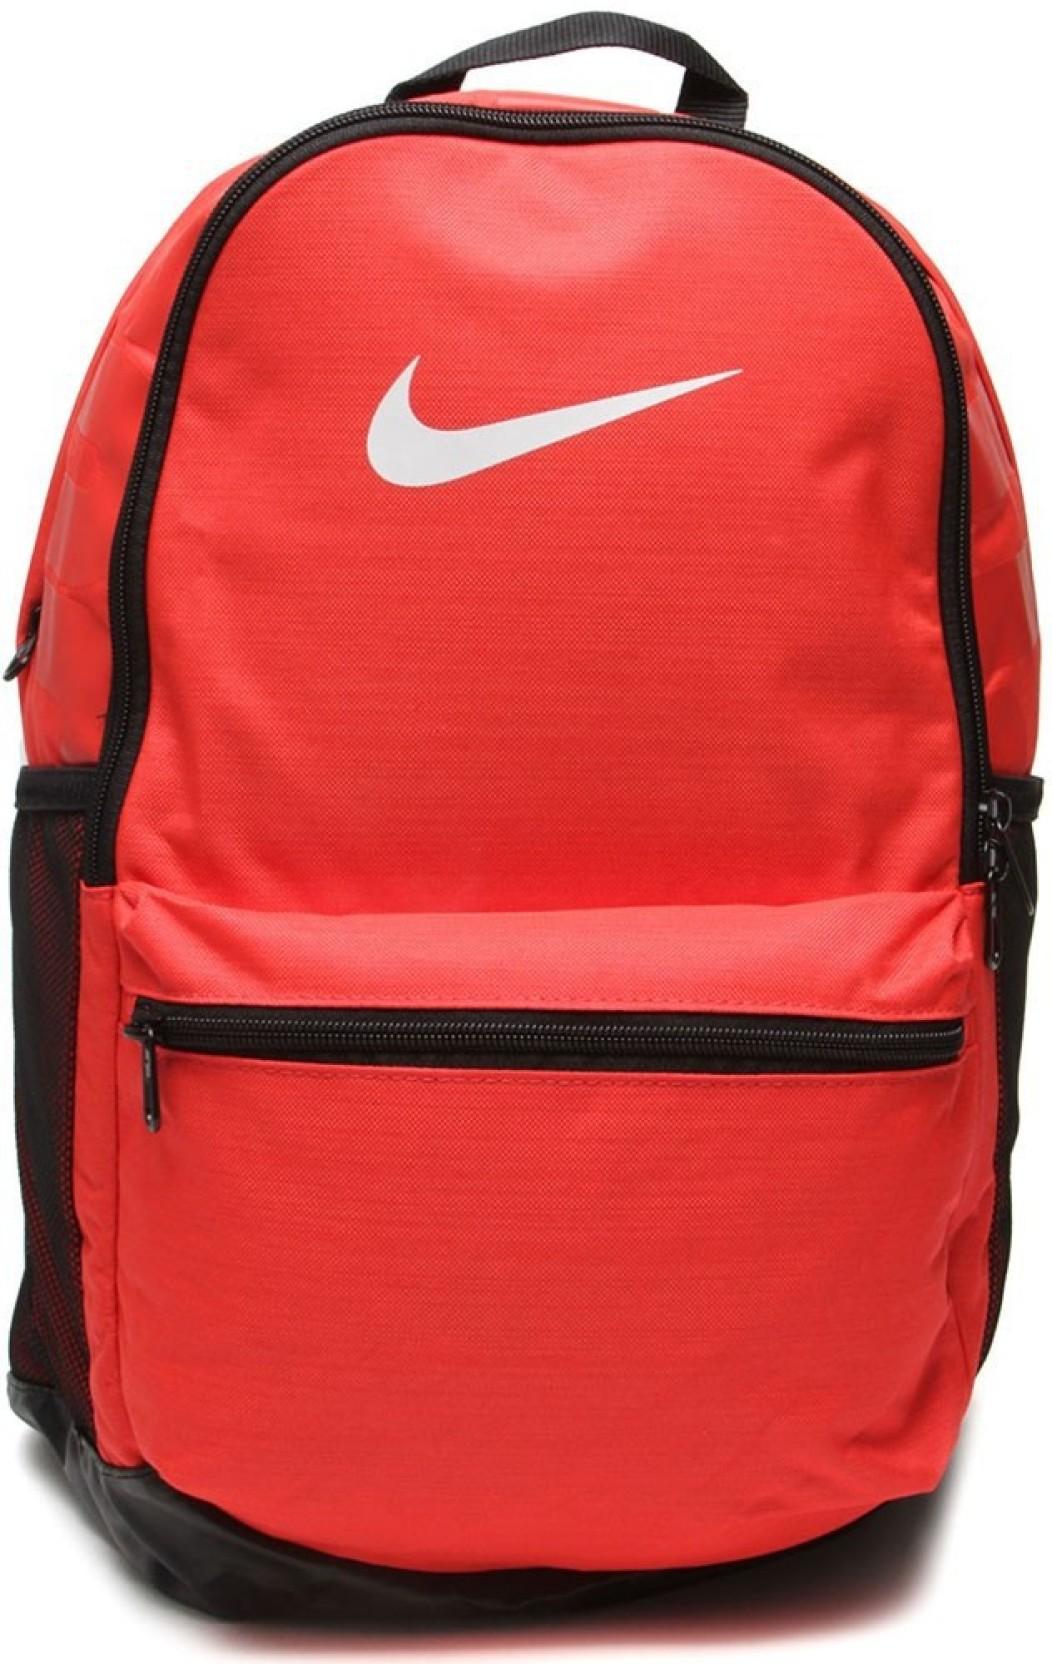 Nike Mesh Backpack Orange- Fenix Toulouse Handball d0cf1c9fcefd7